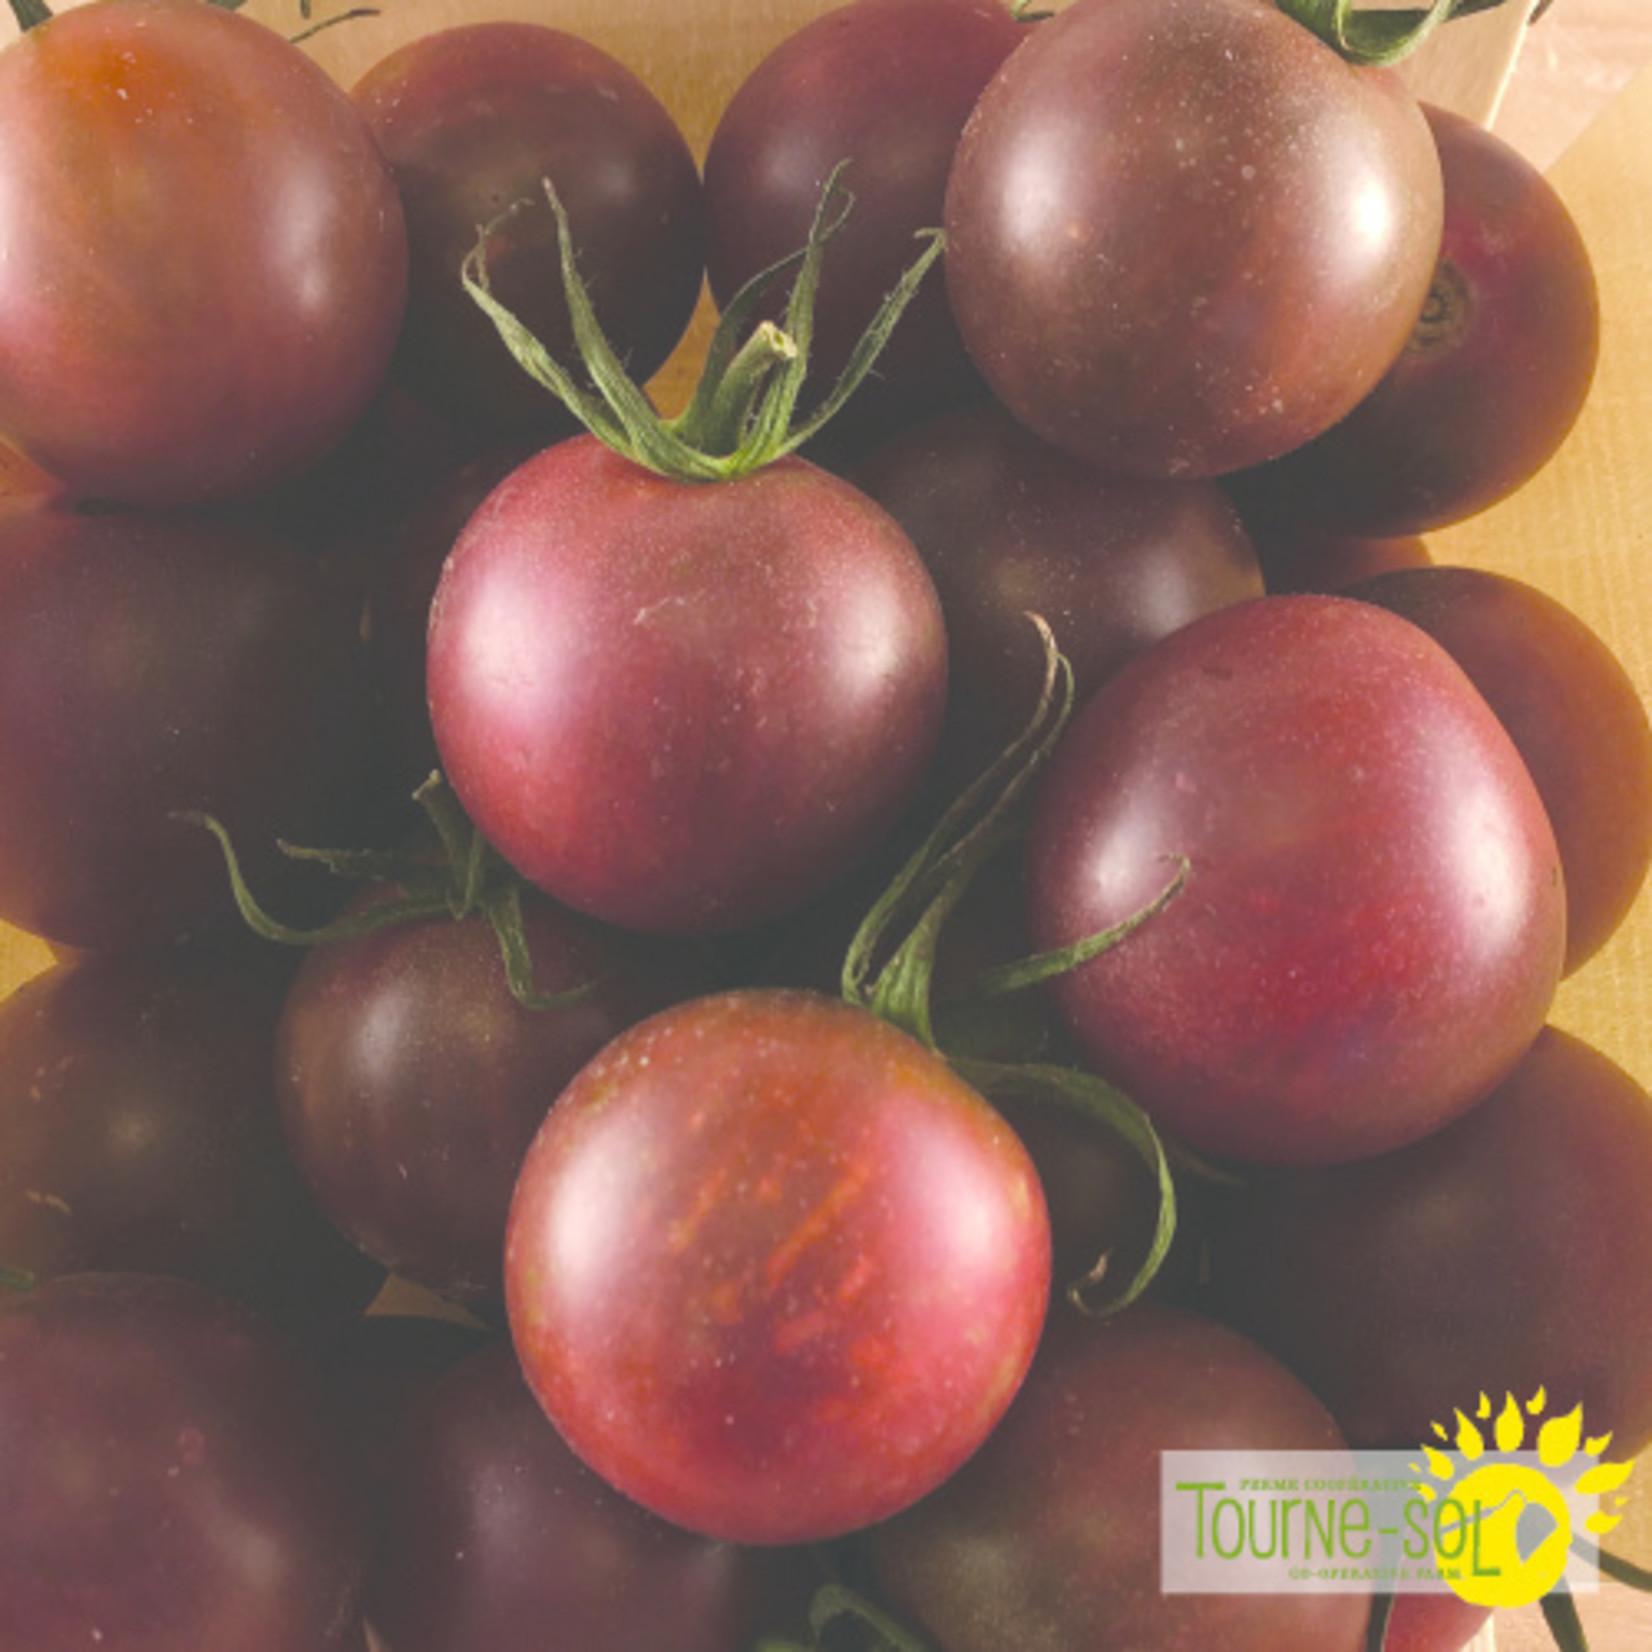 Tourne-Sol Black cherry tomato